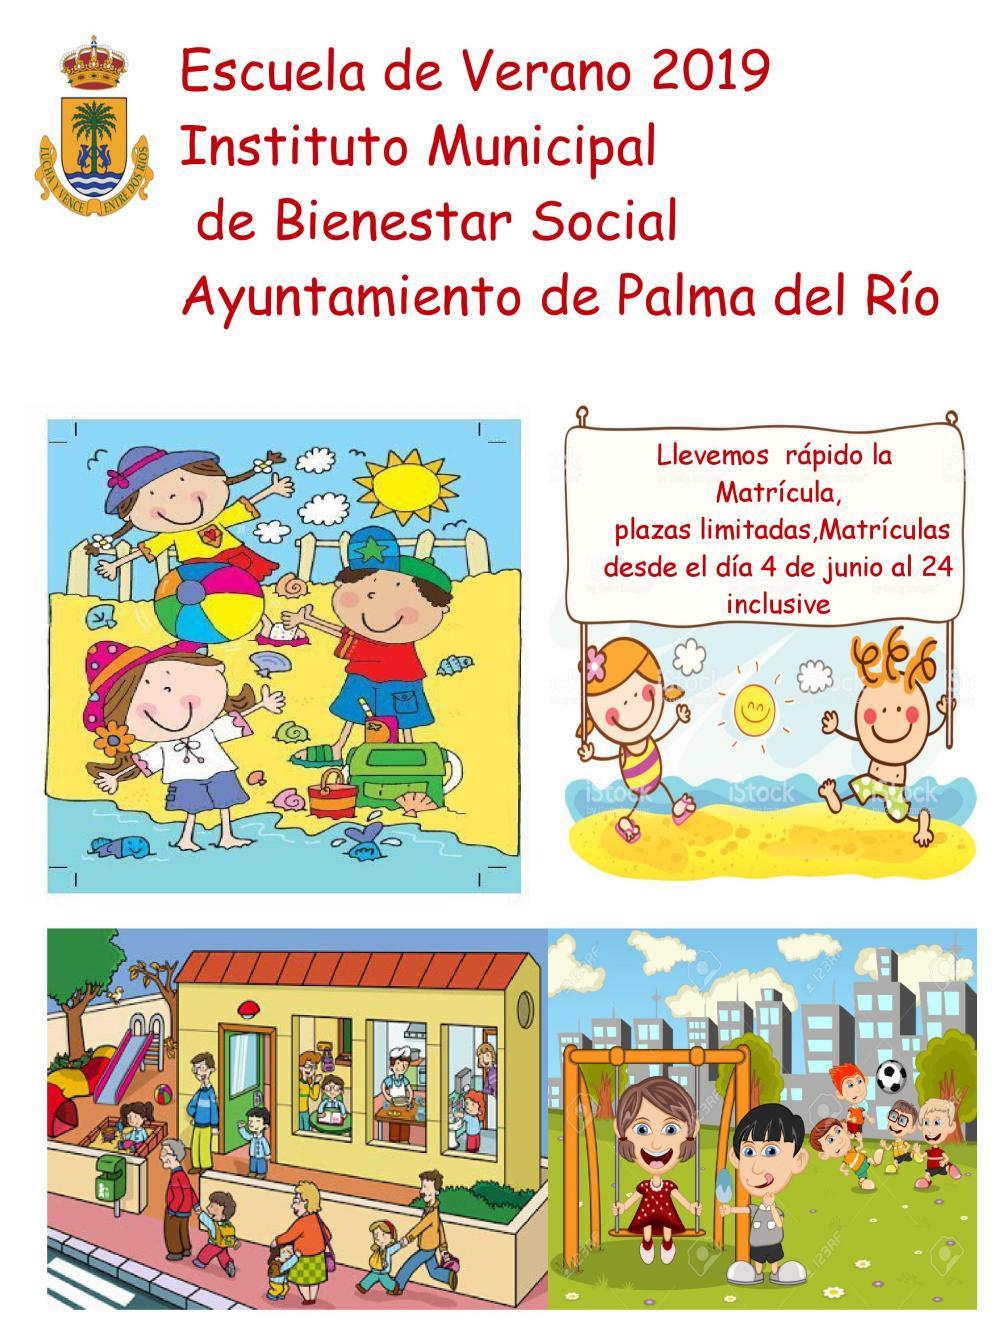 https://www.palmadelrio.es/sites/default/files/escuela_verano_2019.jpg